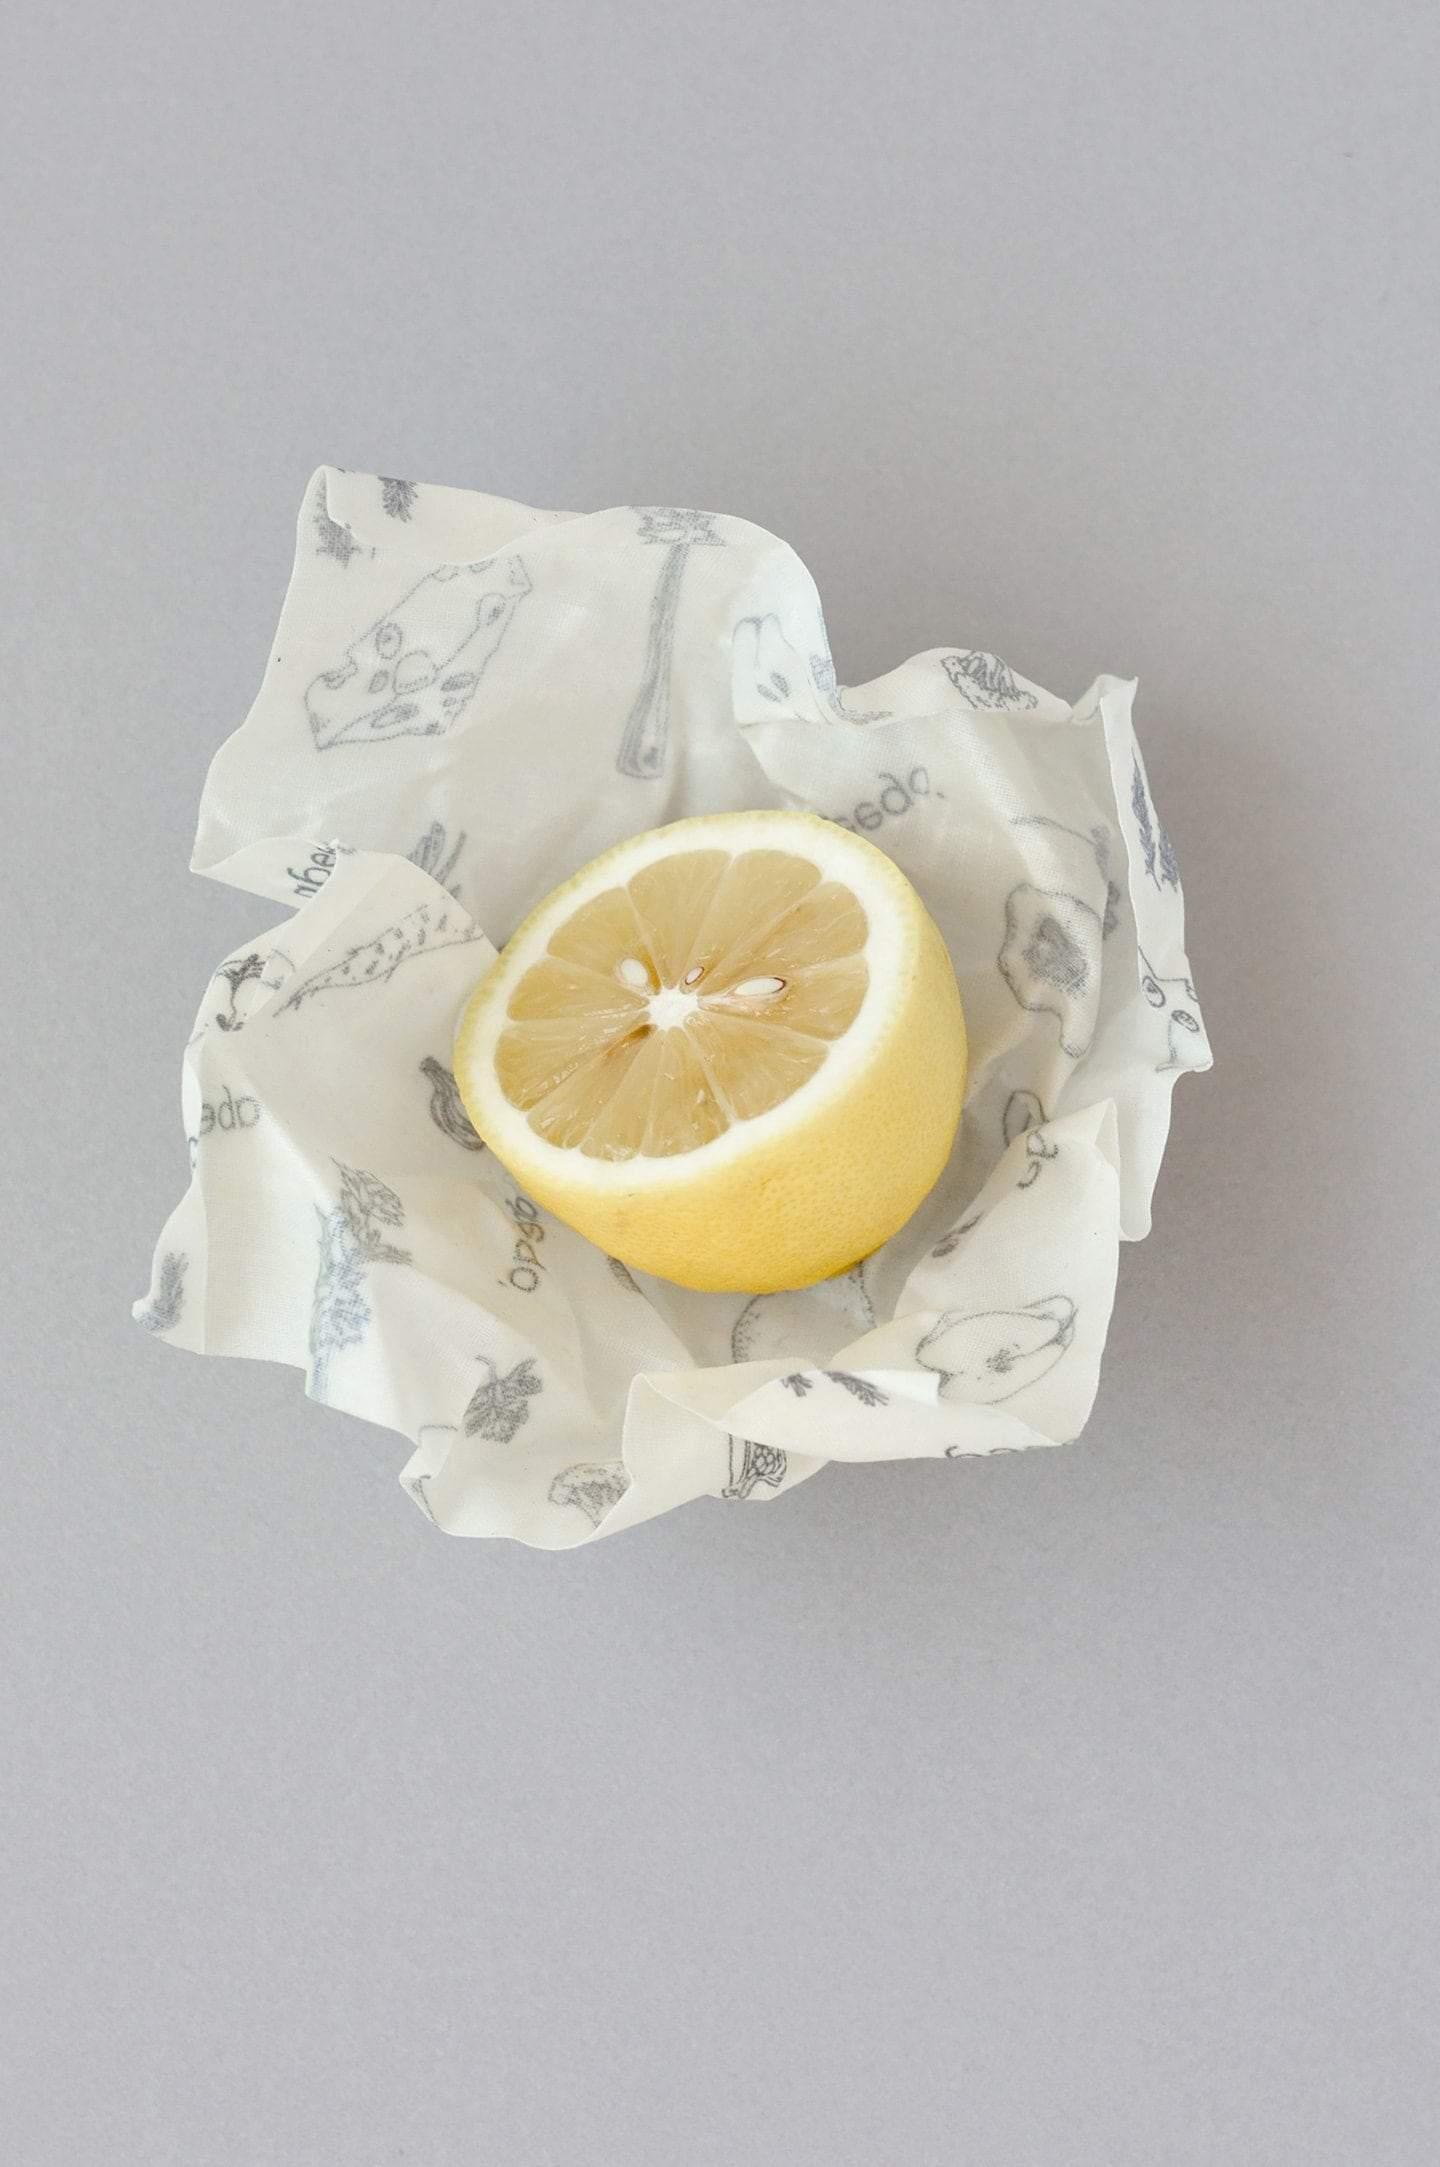 beeswax-wrap-lemon-small-abeego-1_7153d2f4-1010-4855-97f5-57999c456c1b.jpg